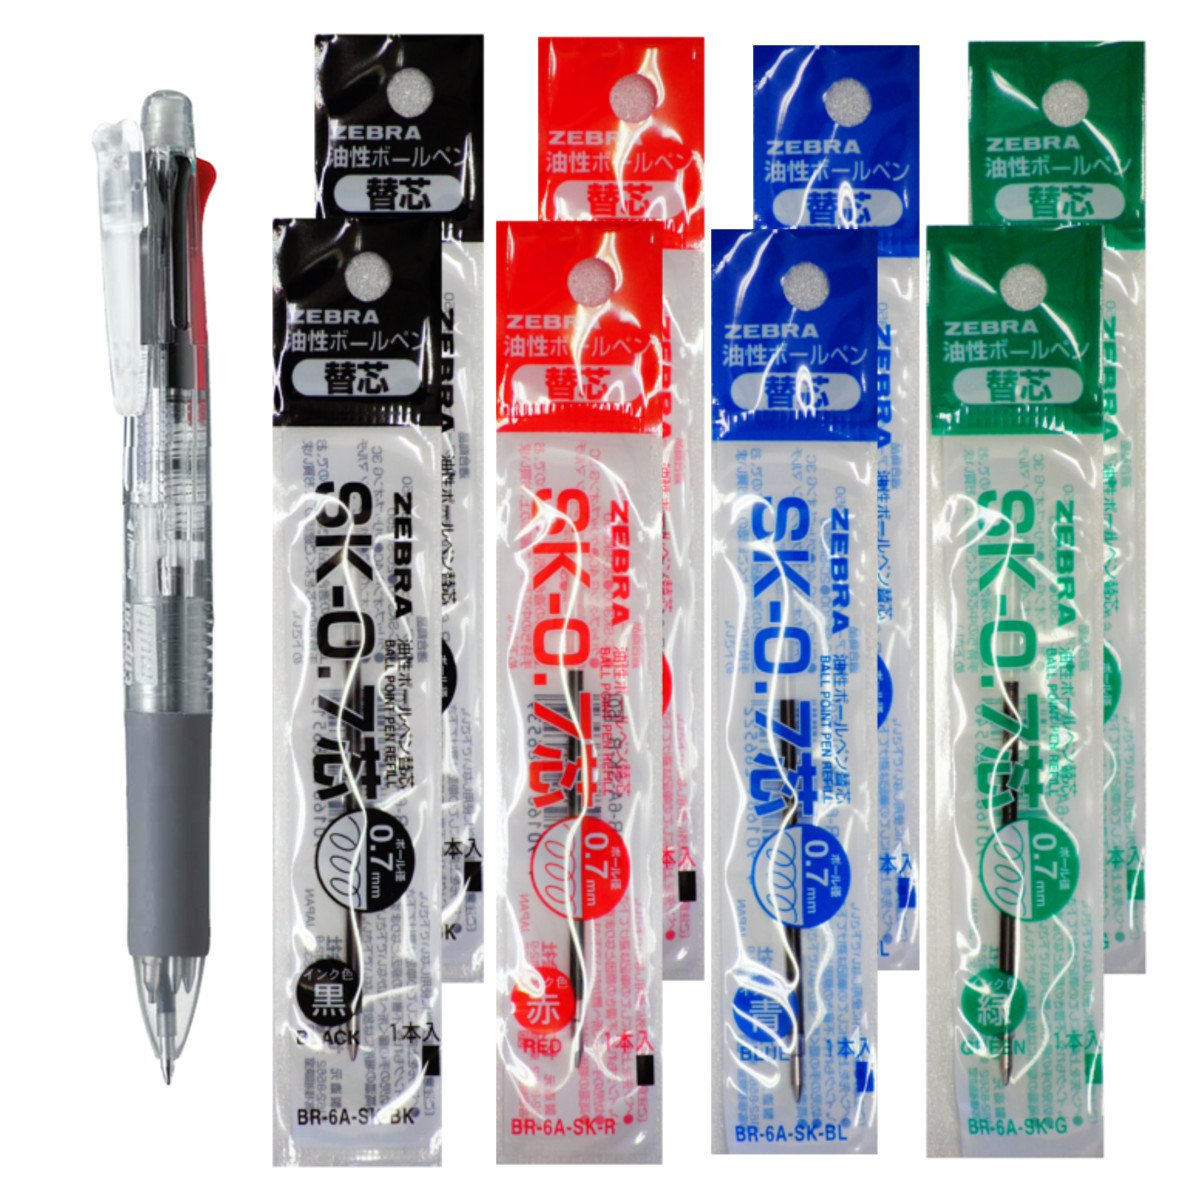 Zebra B4SA-1 Clip-on multi 0.7mm Multifunctional Pen, Clear Body & 4 Color(Black/Blue/Red/Green) Refills 8 Total Value Set